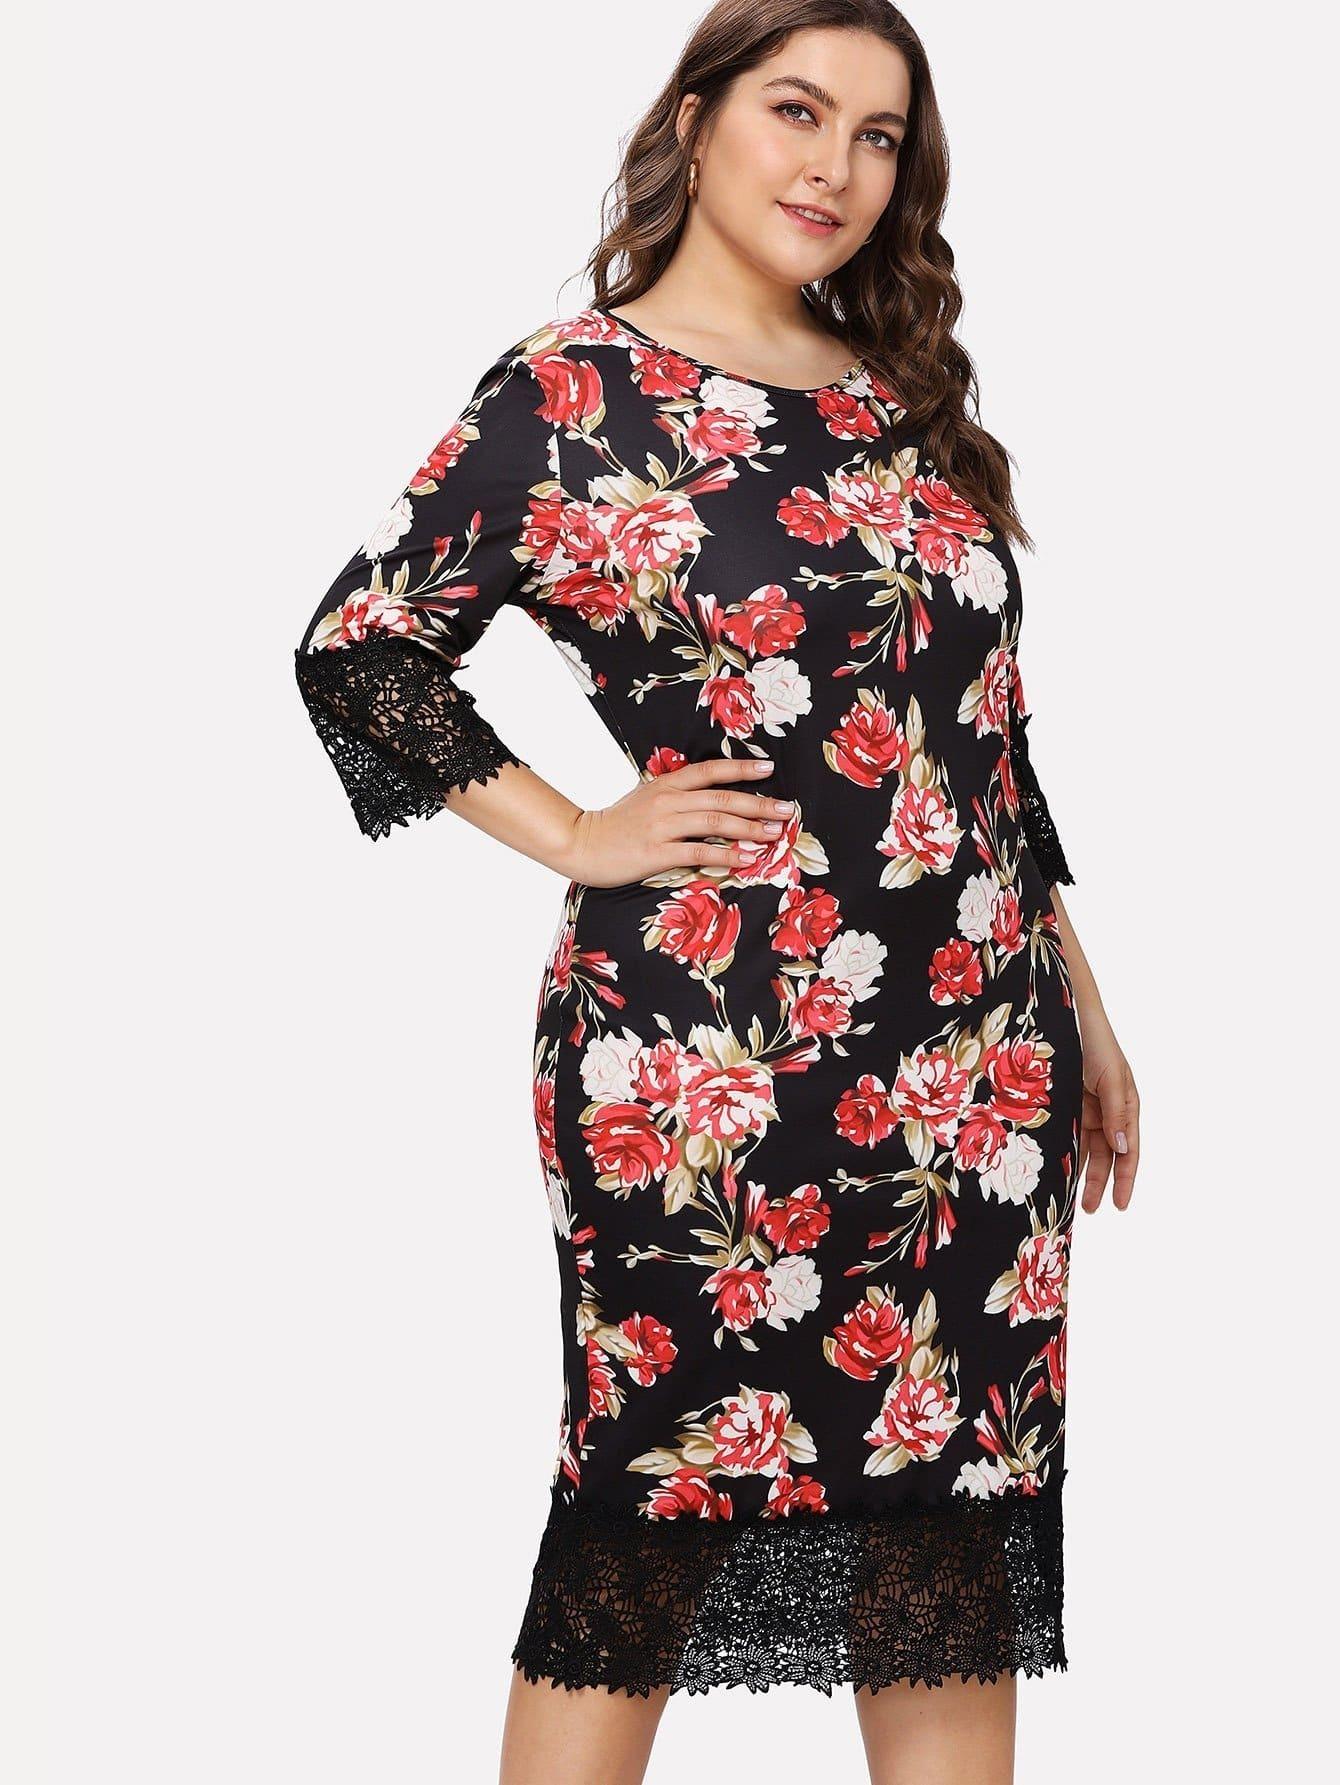 Lace Patchwork Floral Print Dress sunflower print wide legs lace patchwork womens jumpsuits